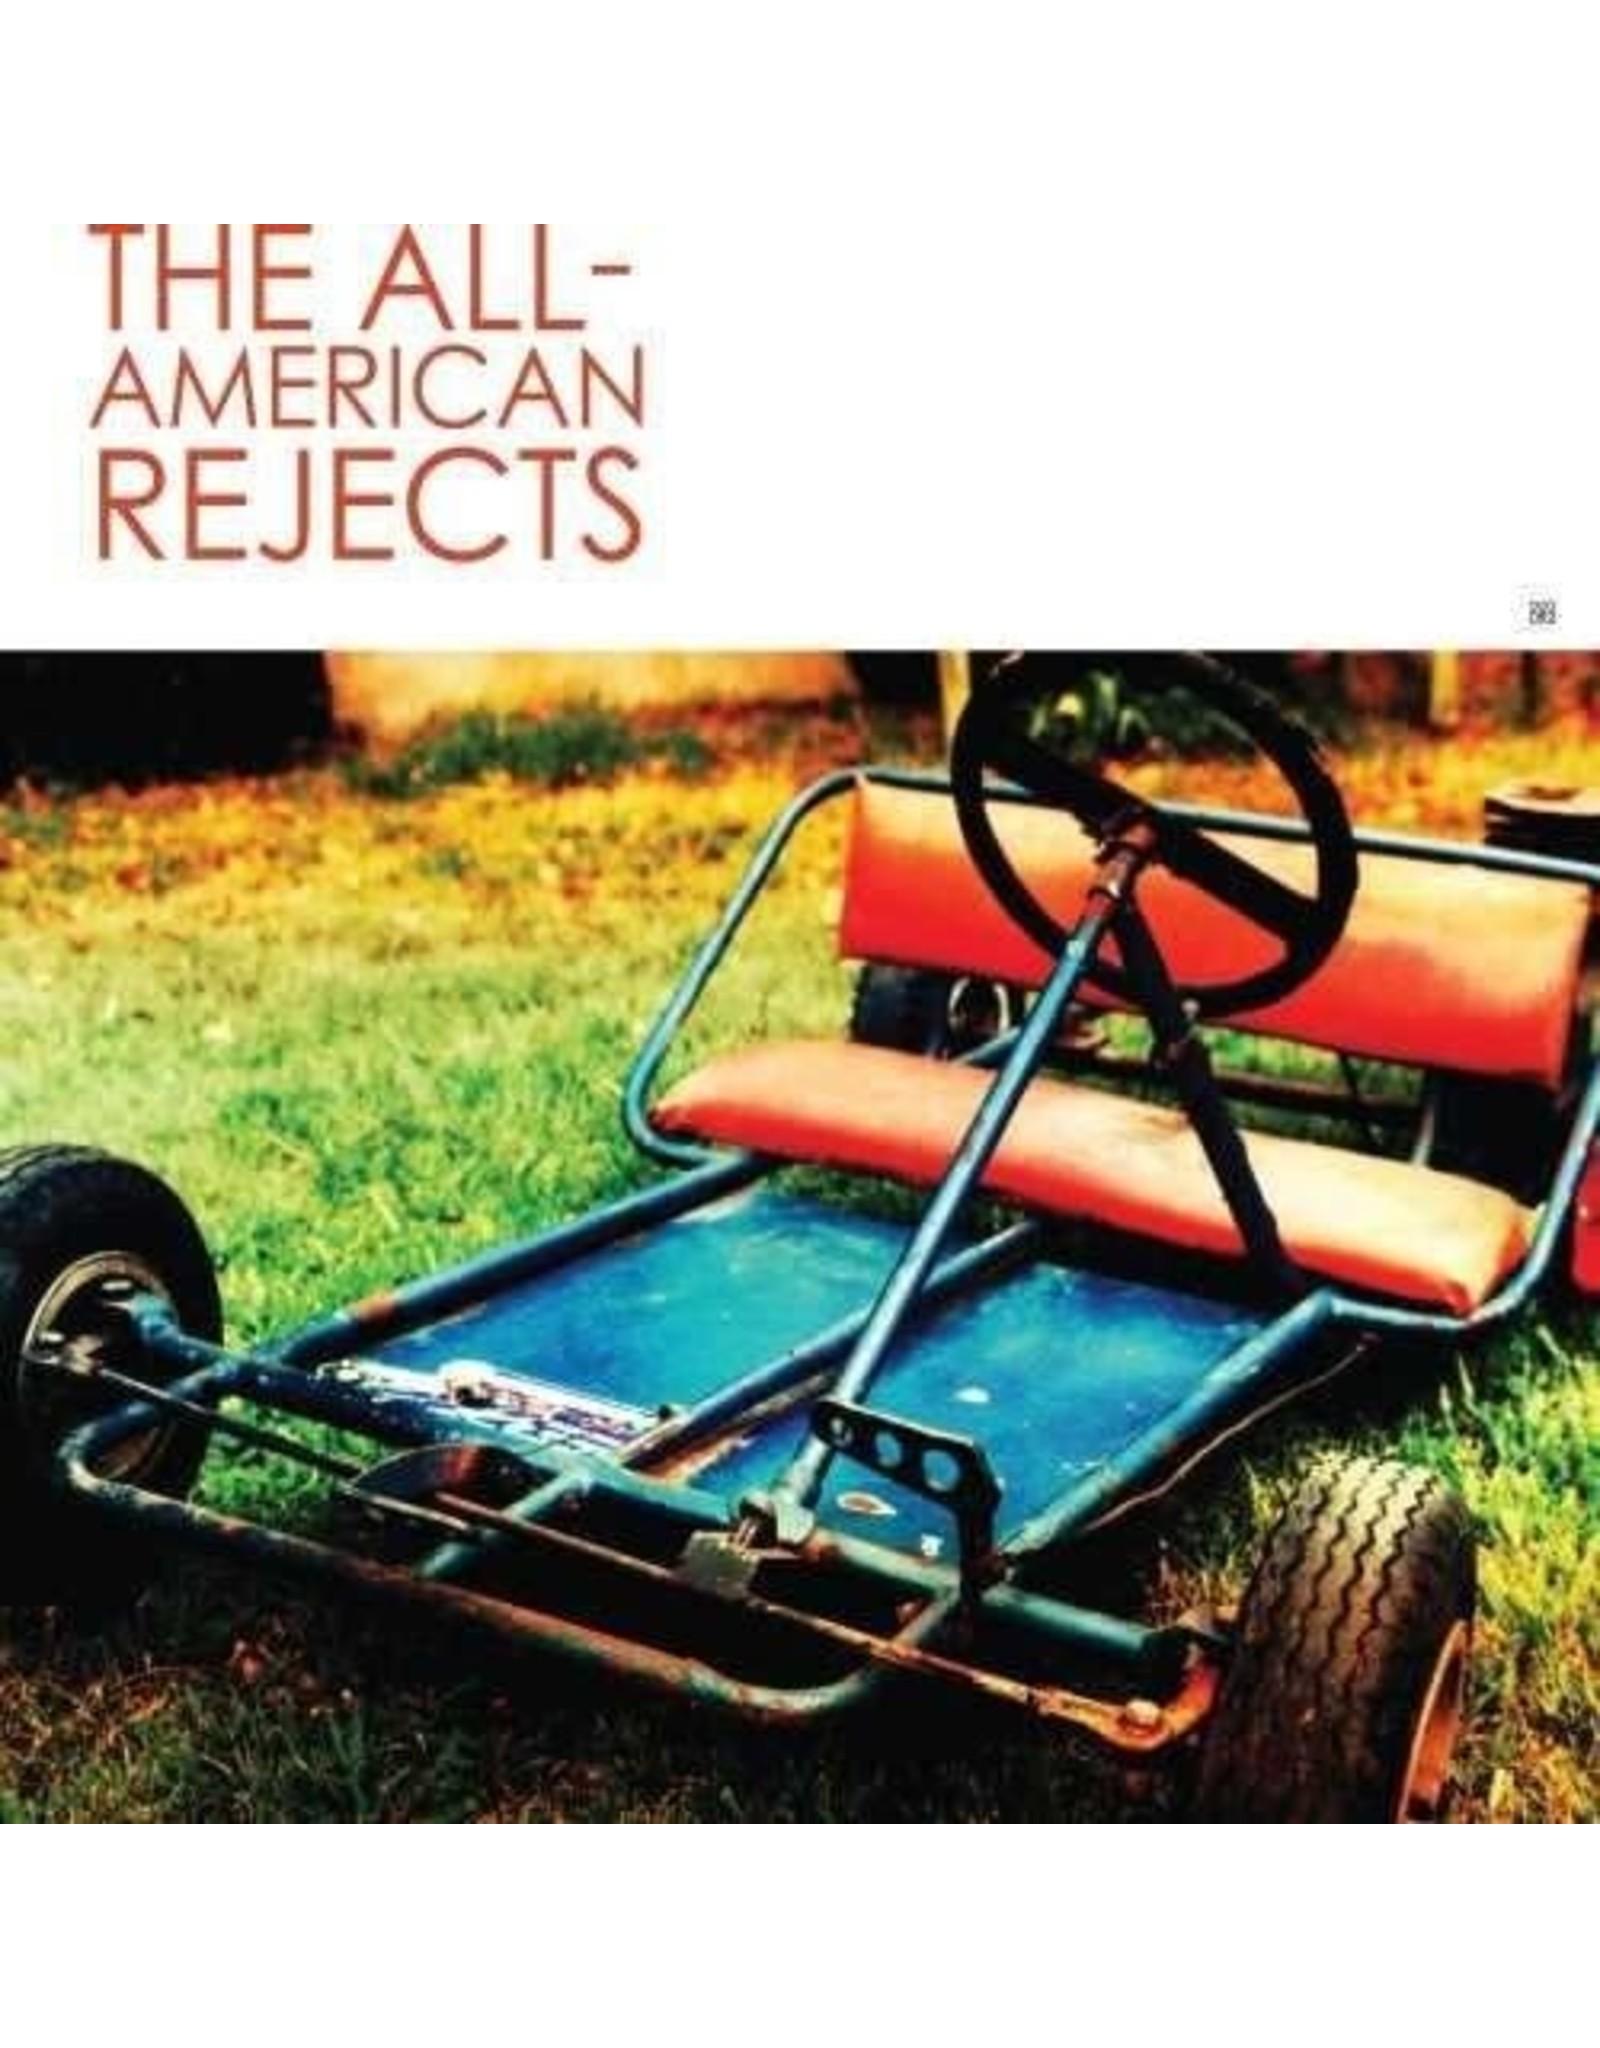 All-American Rejects / All-American Rejects